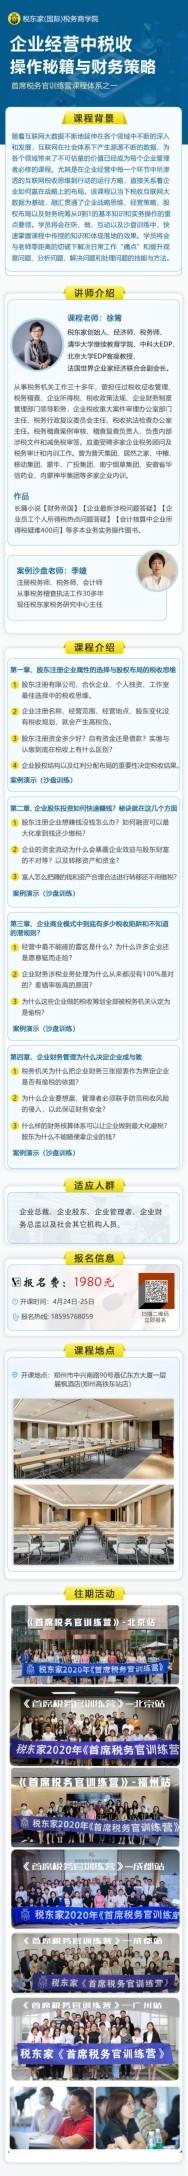 http://www.huodongxing.com/file/20190926/5283555452352/934103002858523.jpg